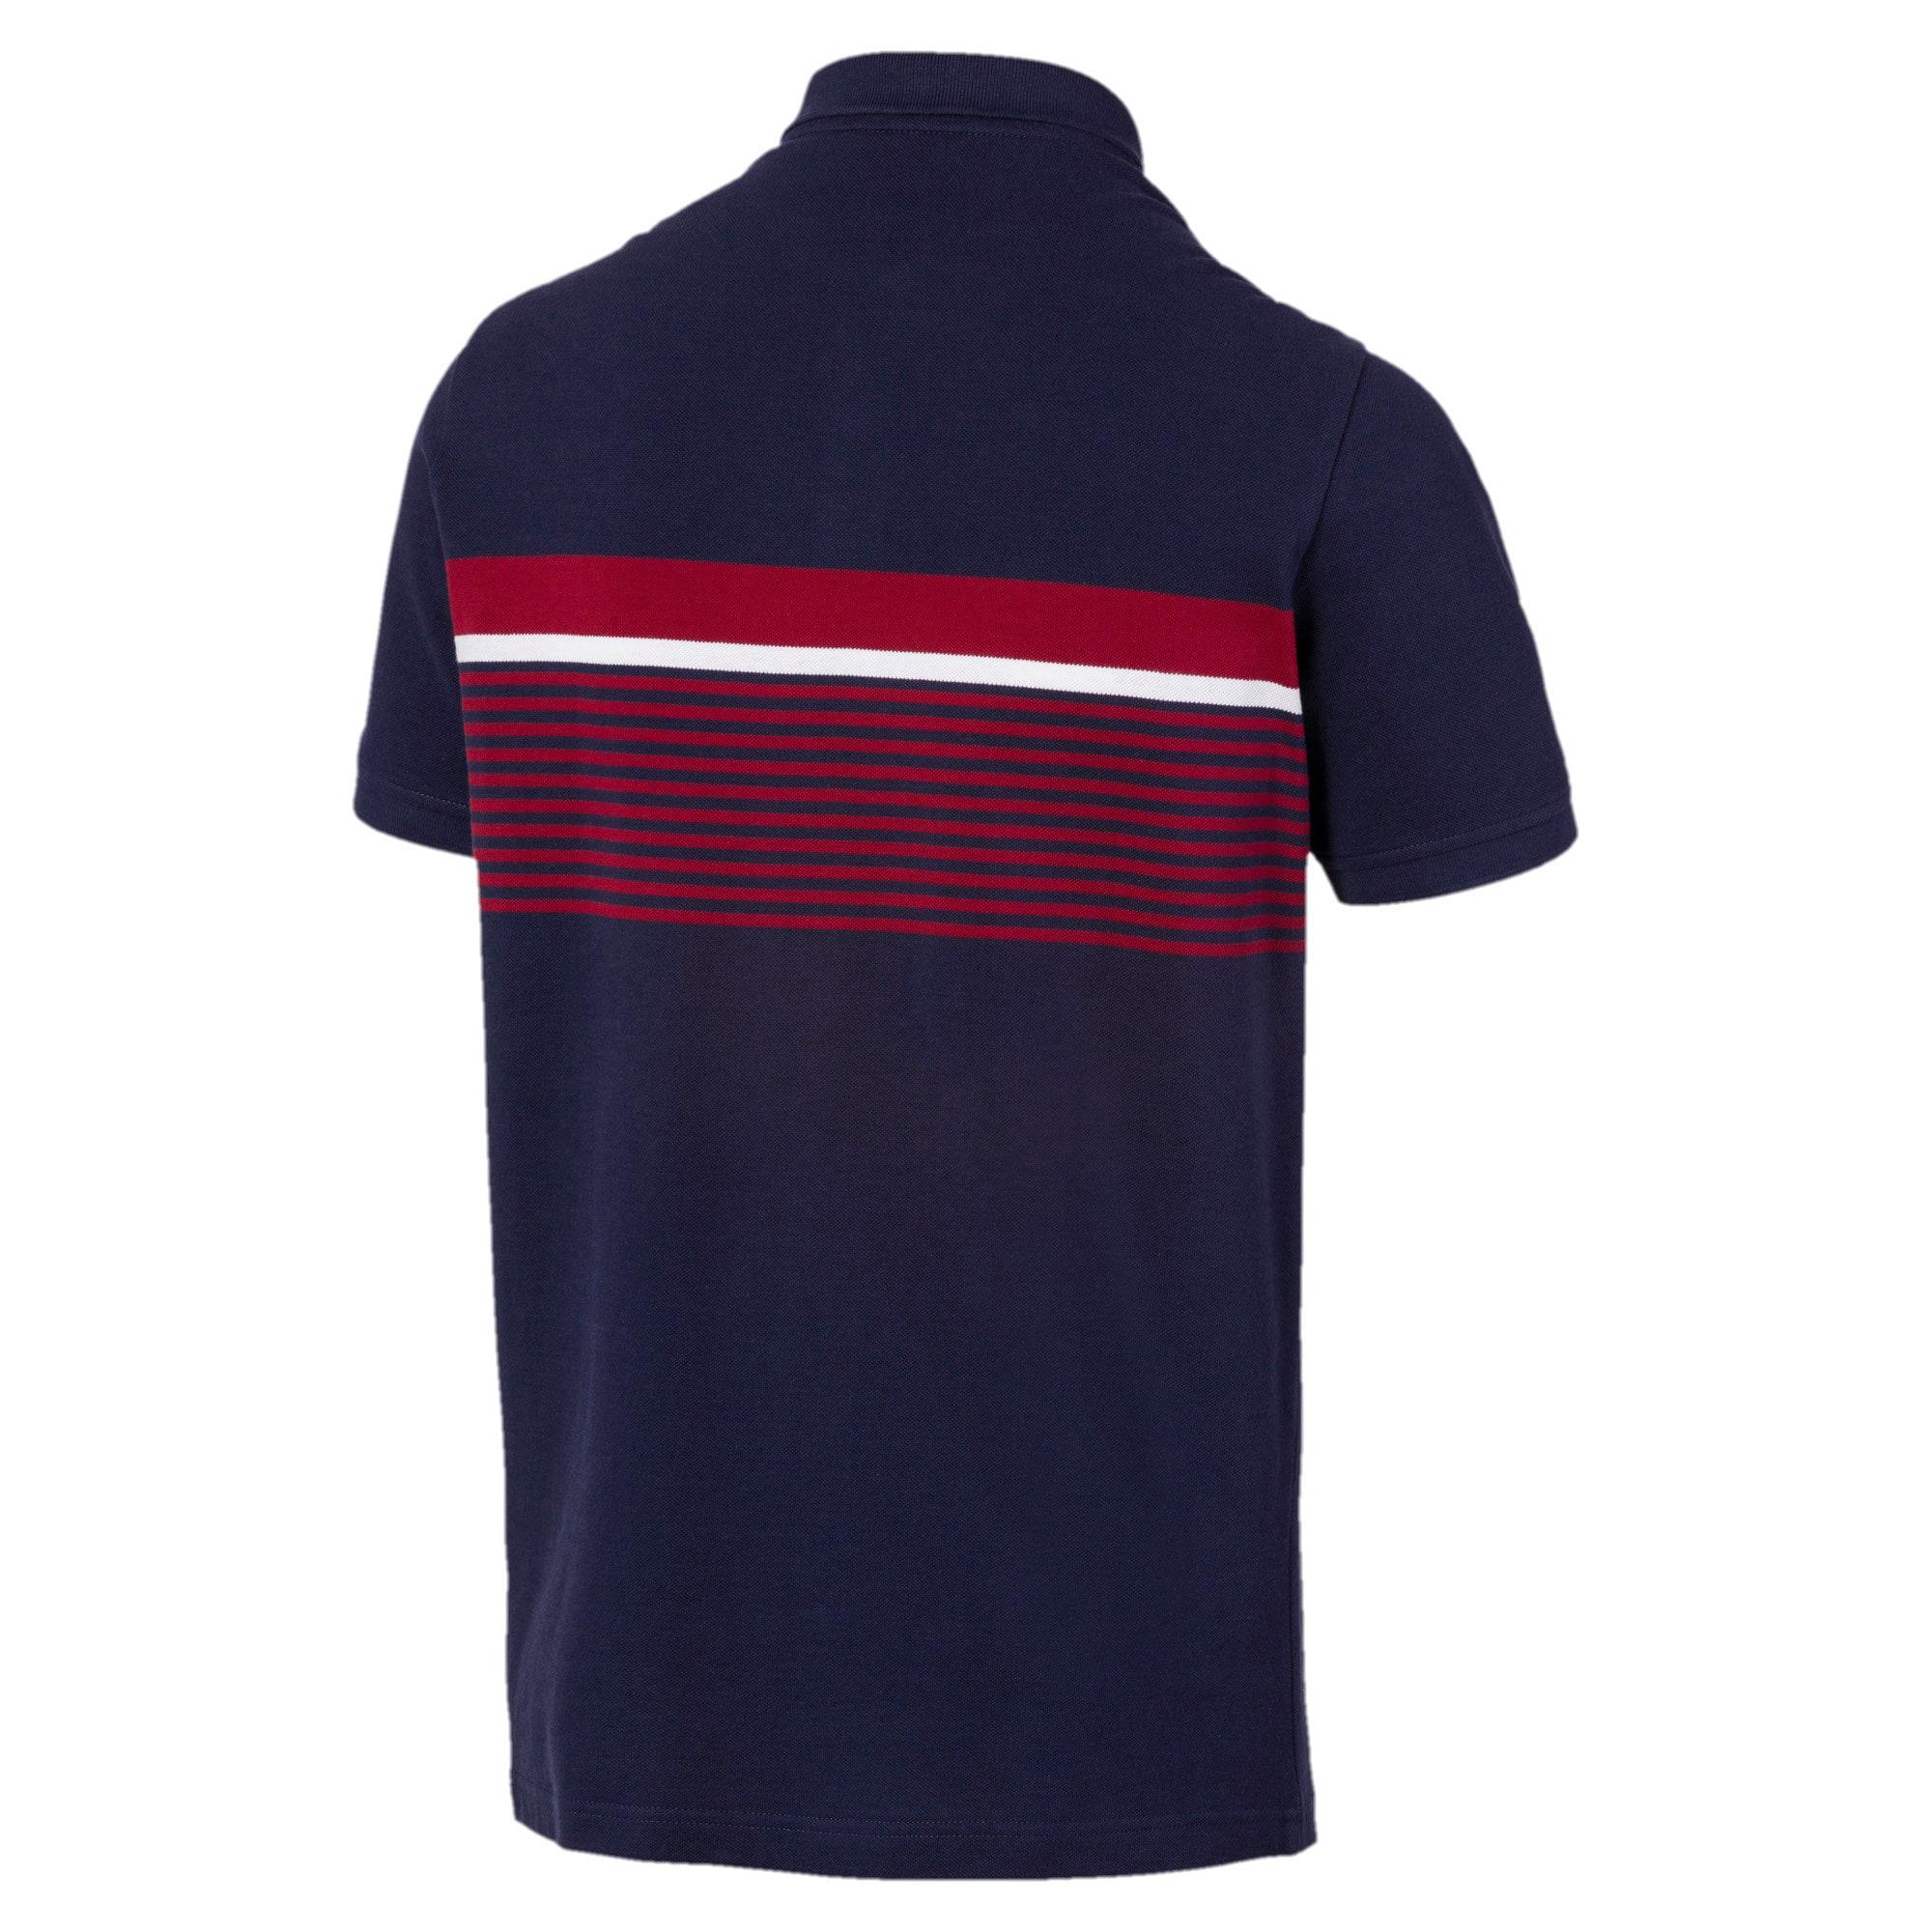 Miniatura 5 de Camiseta tipo polo ESS+ Striped para hombre, Peacoat, mediano